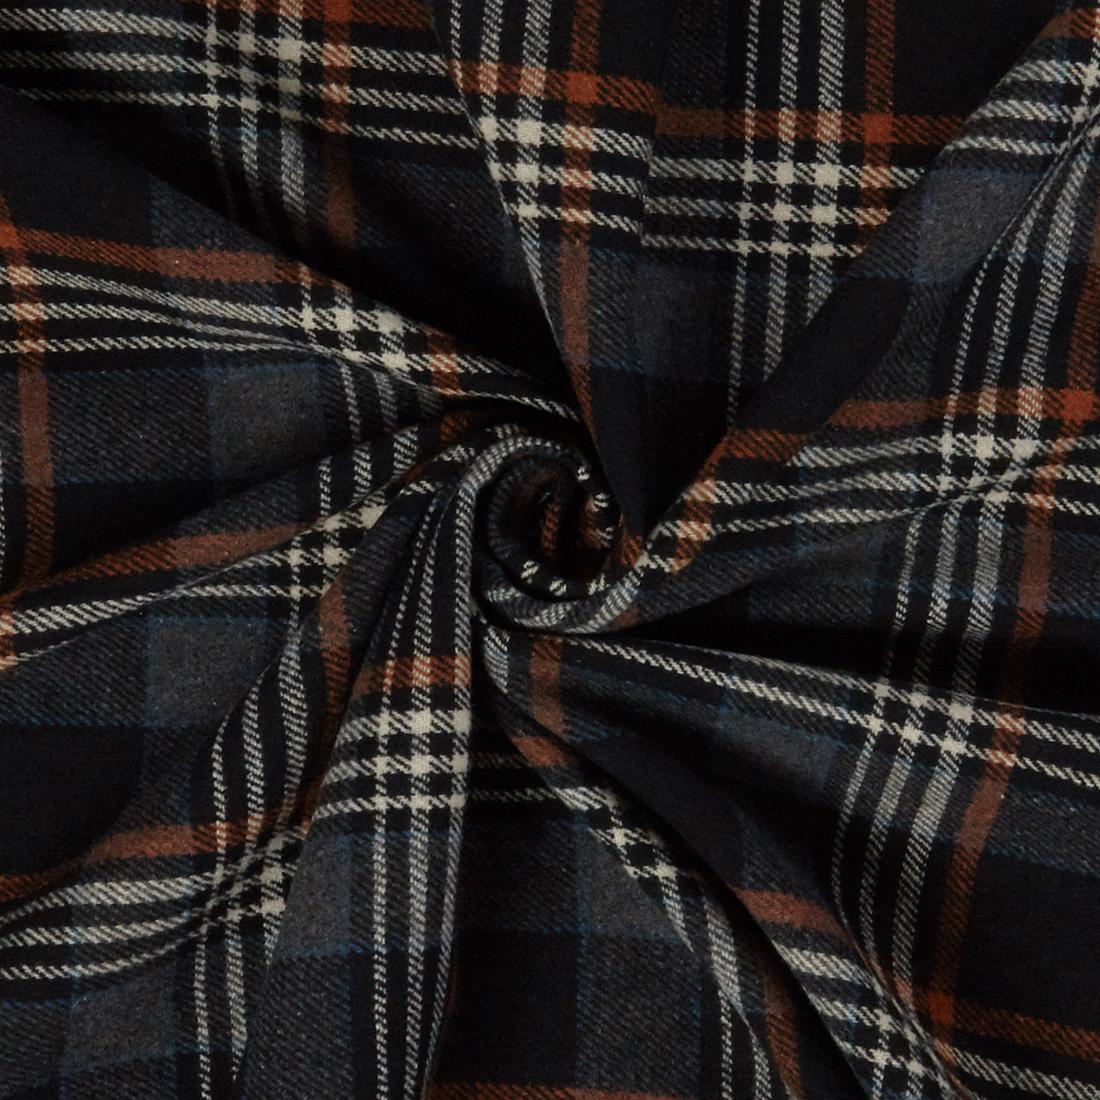 Flannel Check Black Dress Fabric